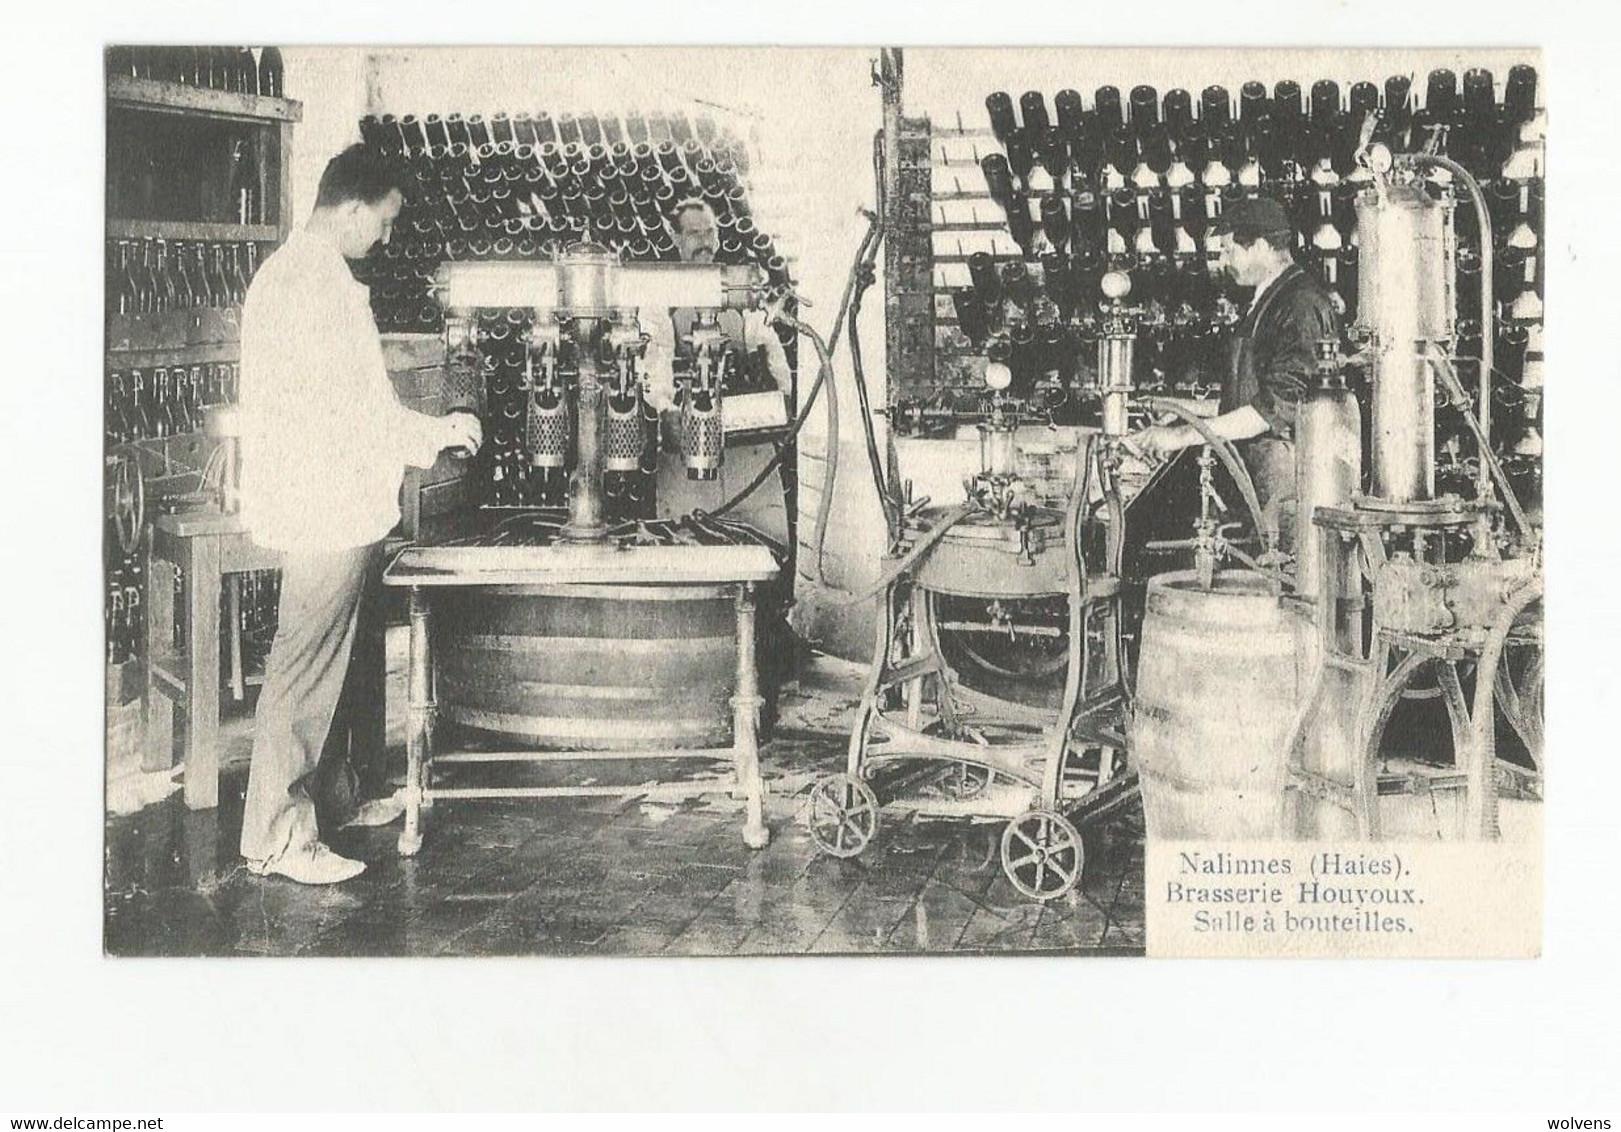 Nalinnes Haies Brasserie Georges Houyoux Salle De Mise En Bouteille CPA 1907 Pompes Soutirage Bierre Brouwerij - Ham-sur-Heure-Nalinnes